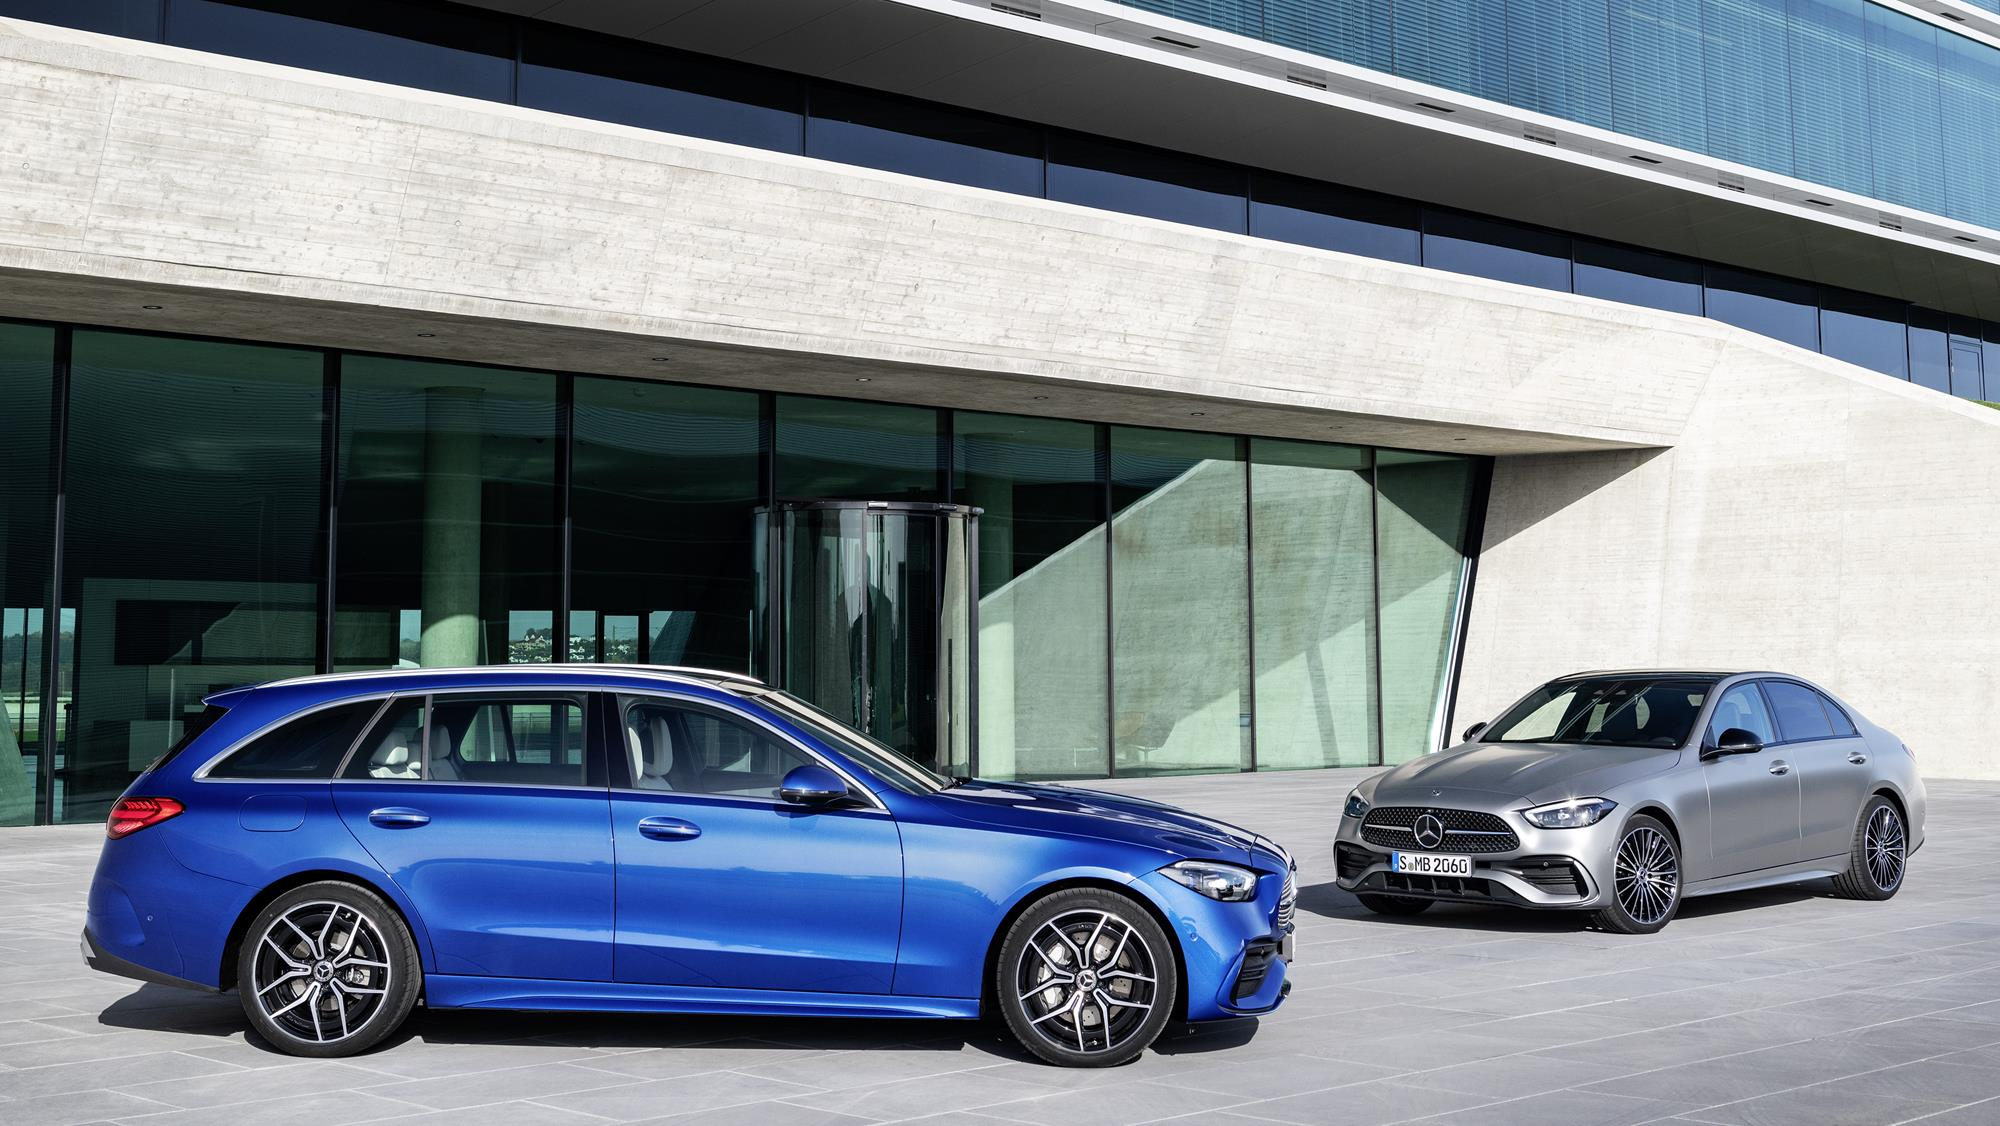 Mercedes-Benz-Classe-C-2022-20.jpg